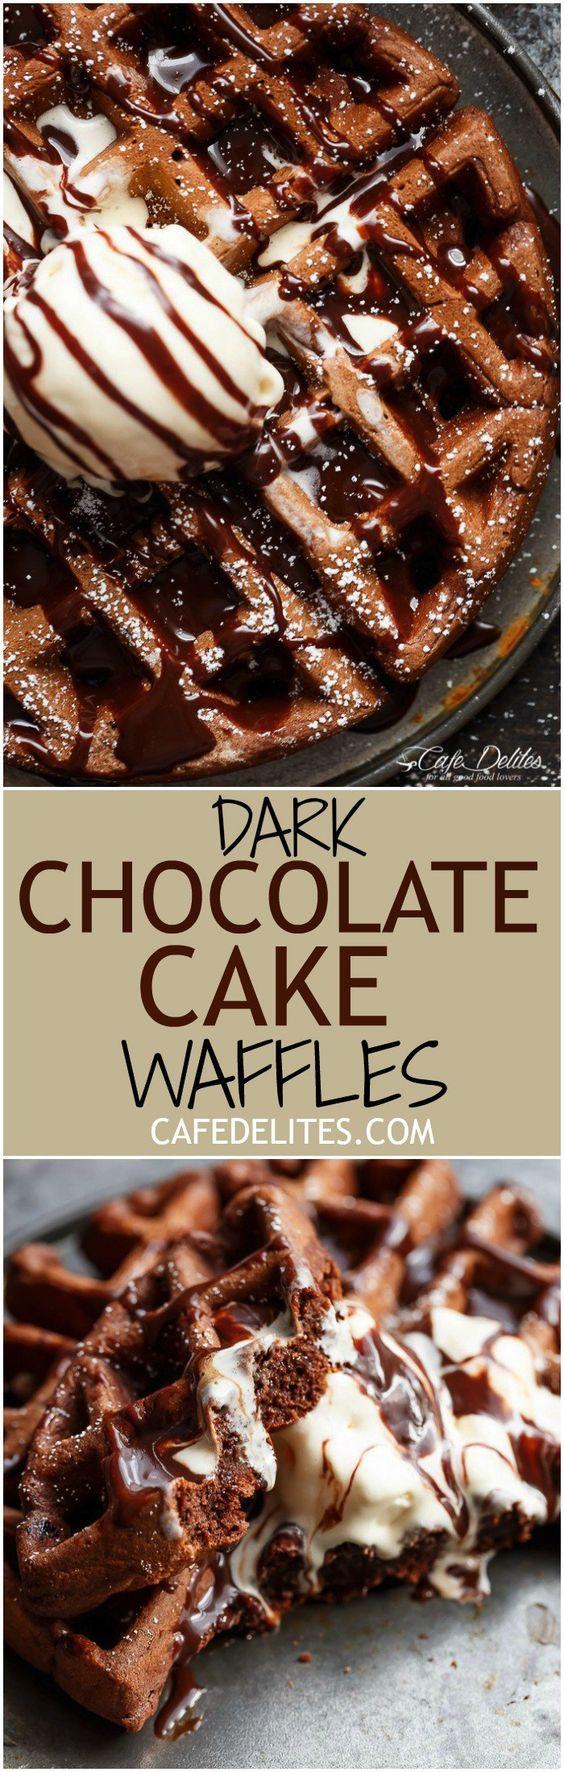 waffles decadent chocolate cake dark chocolate cakes waffles chocolate ...